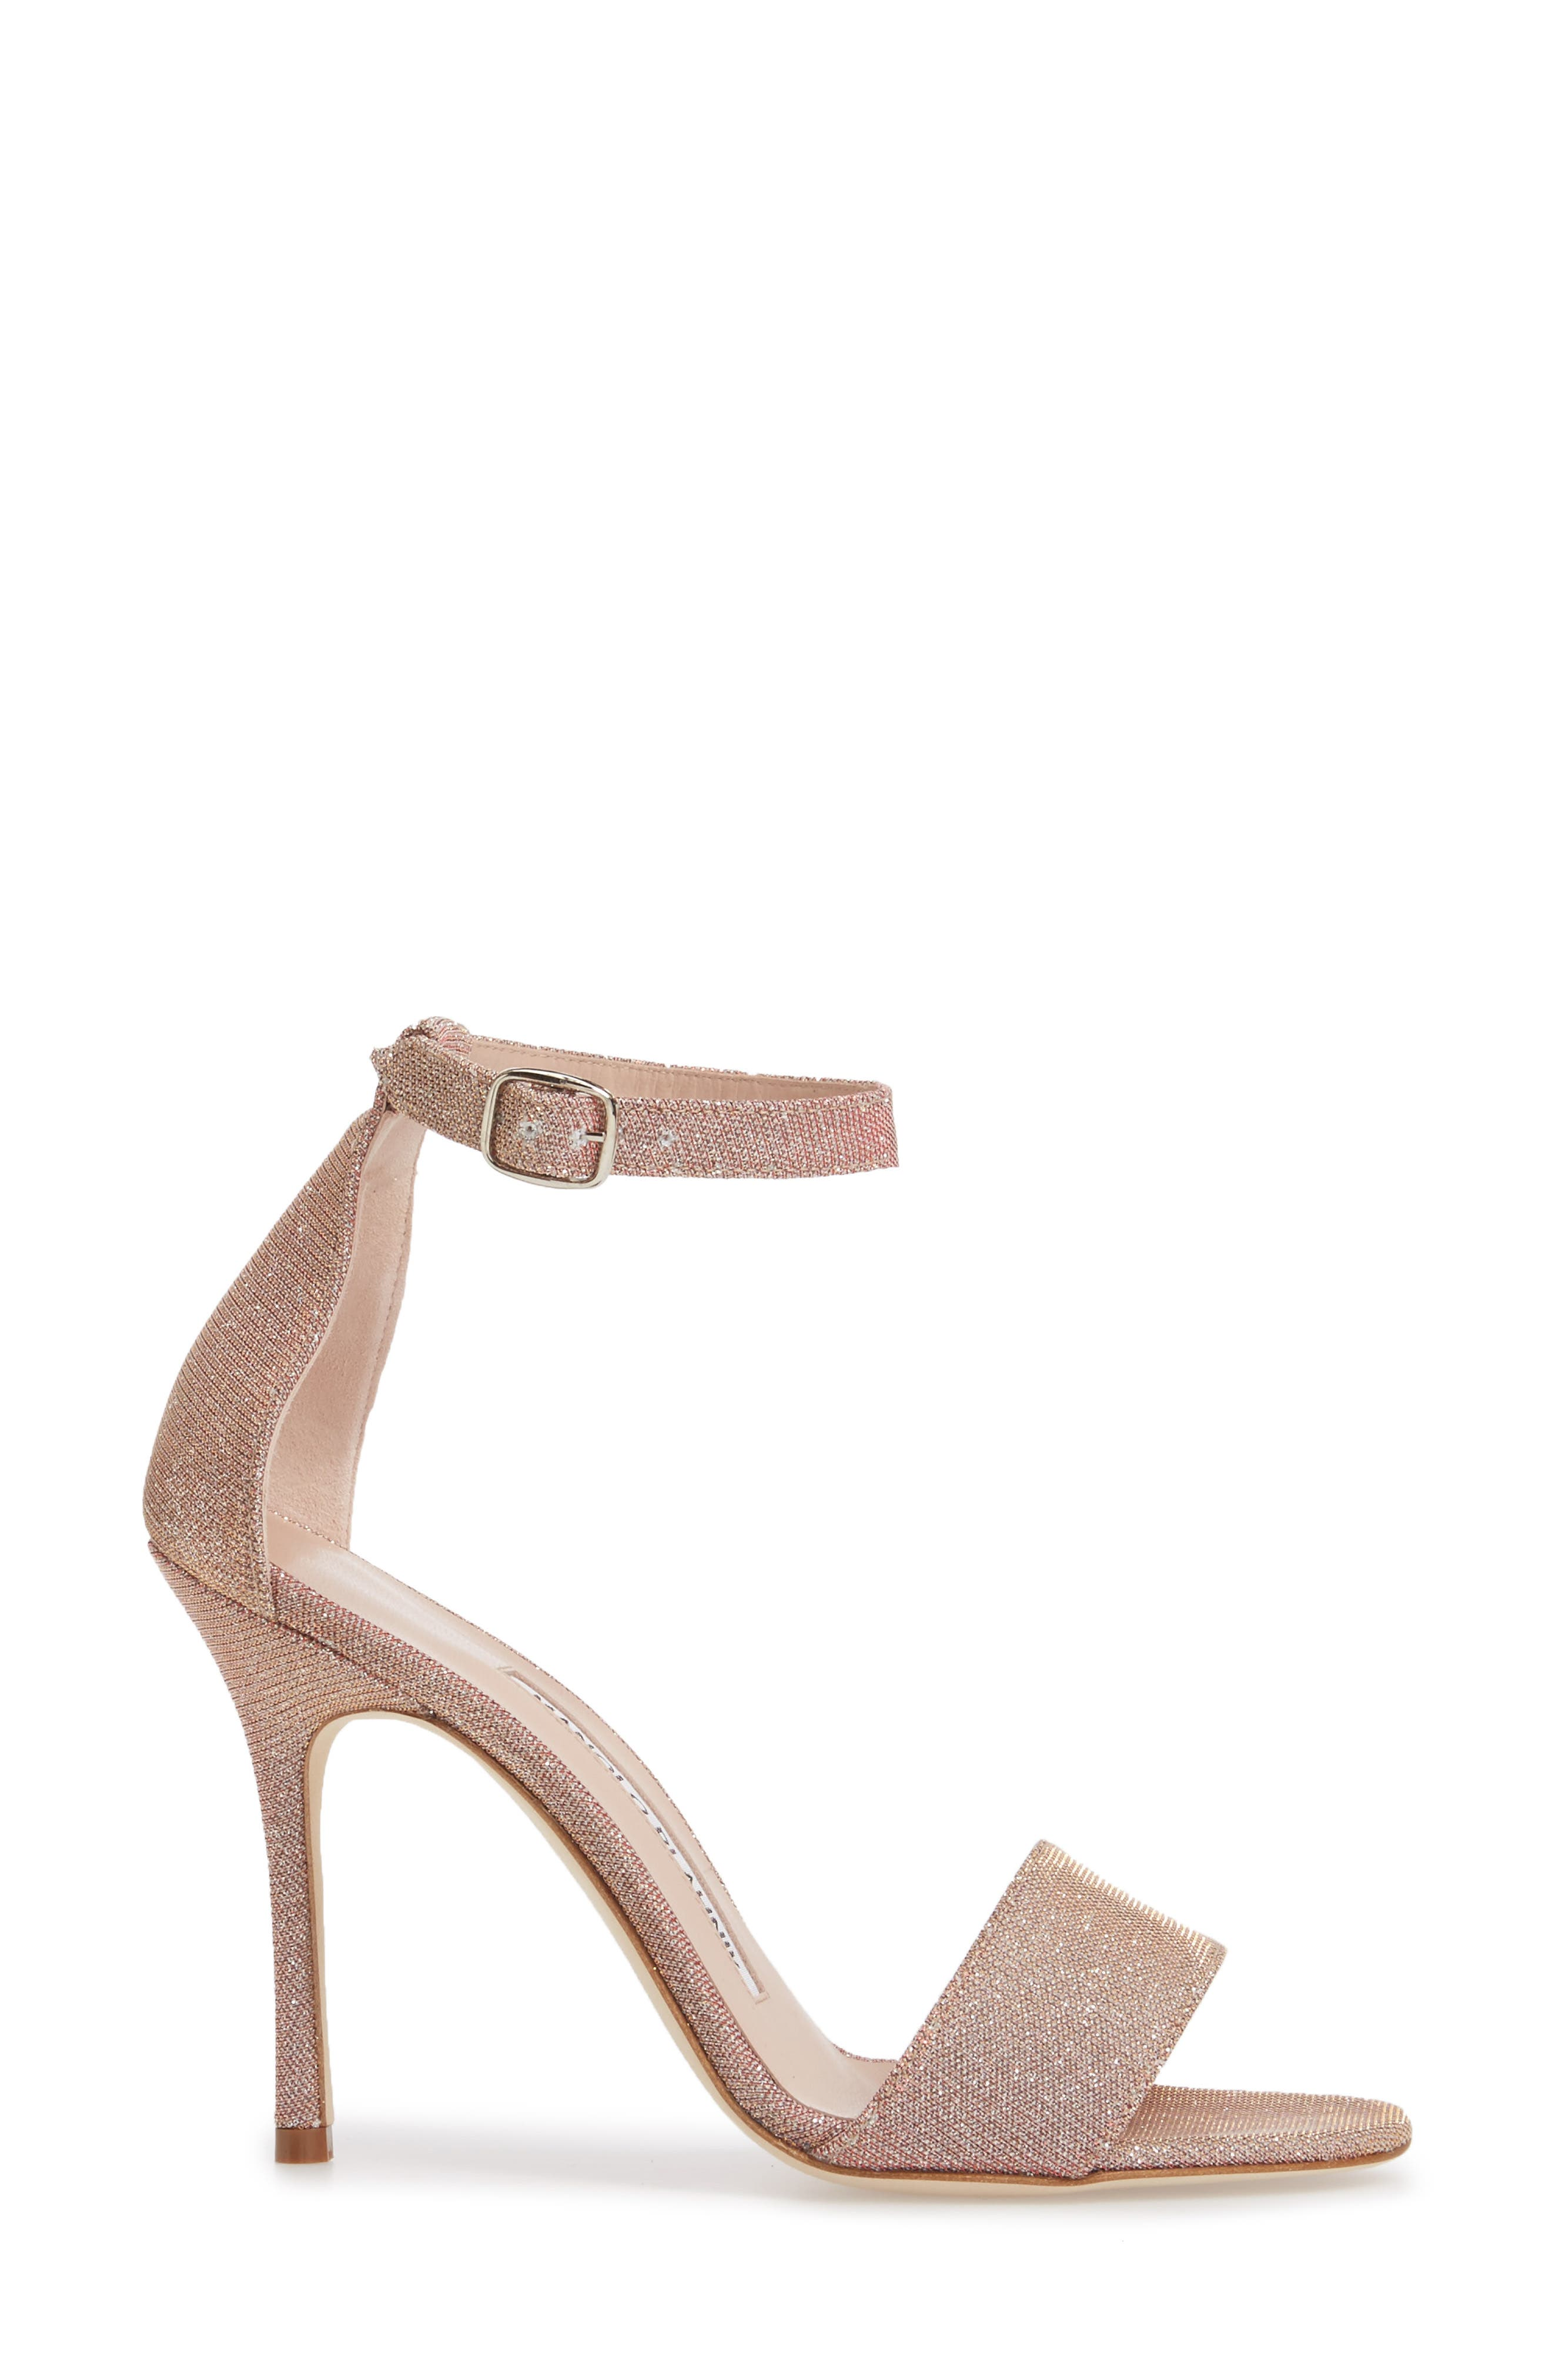 Tres Ankle Strap Sandal,                             Alternate thumbnail 3, color,                             Champagne Notturno